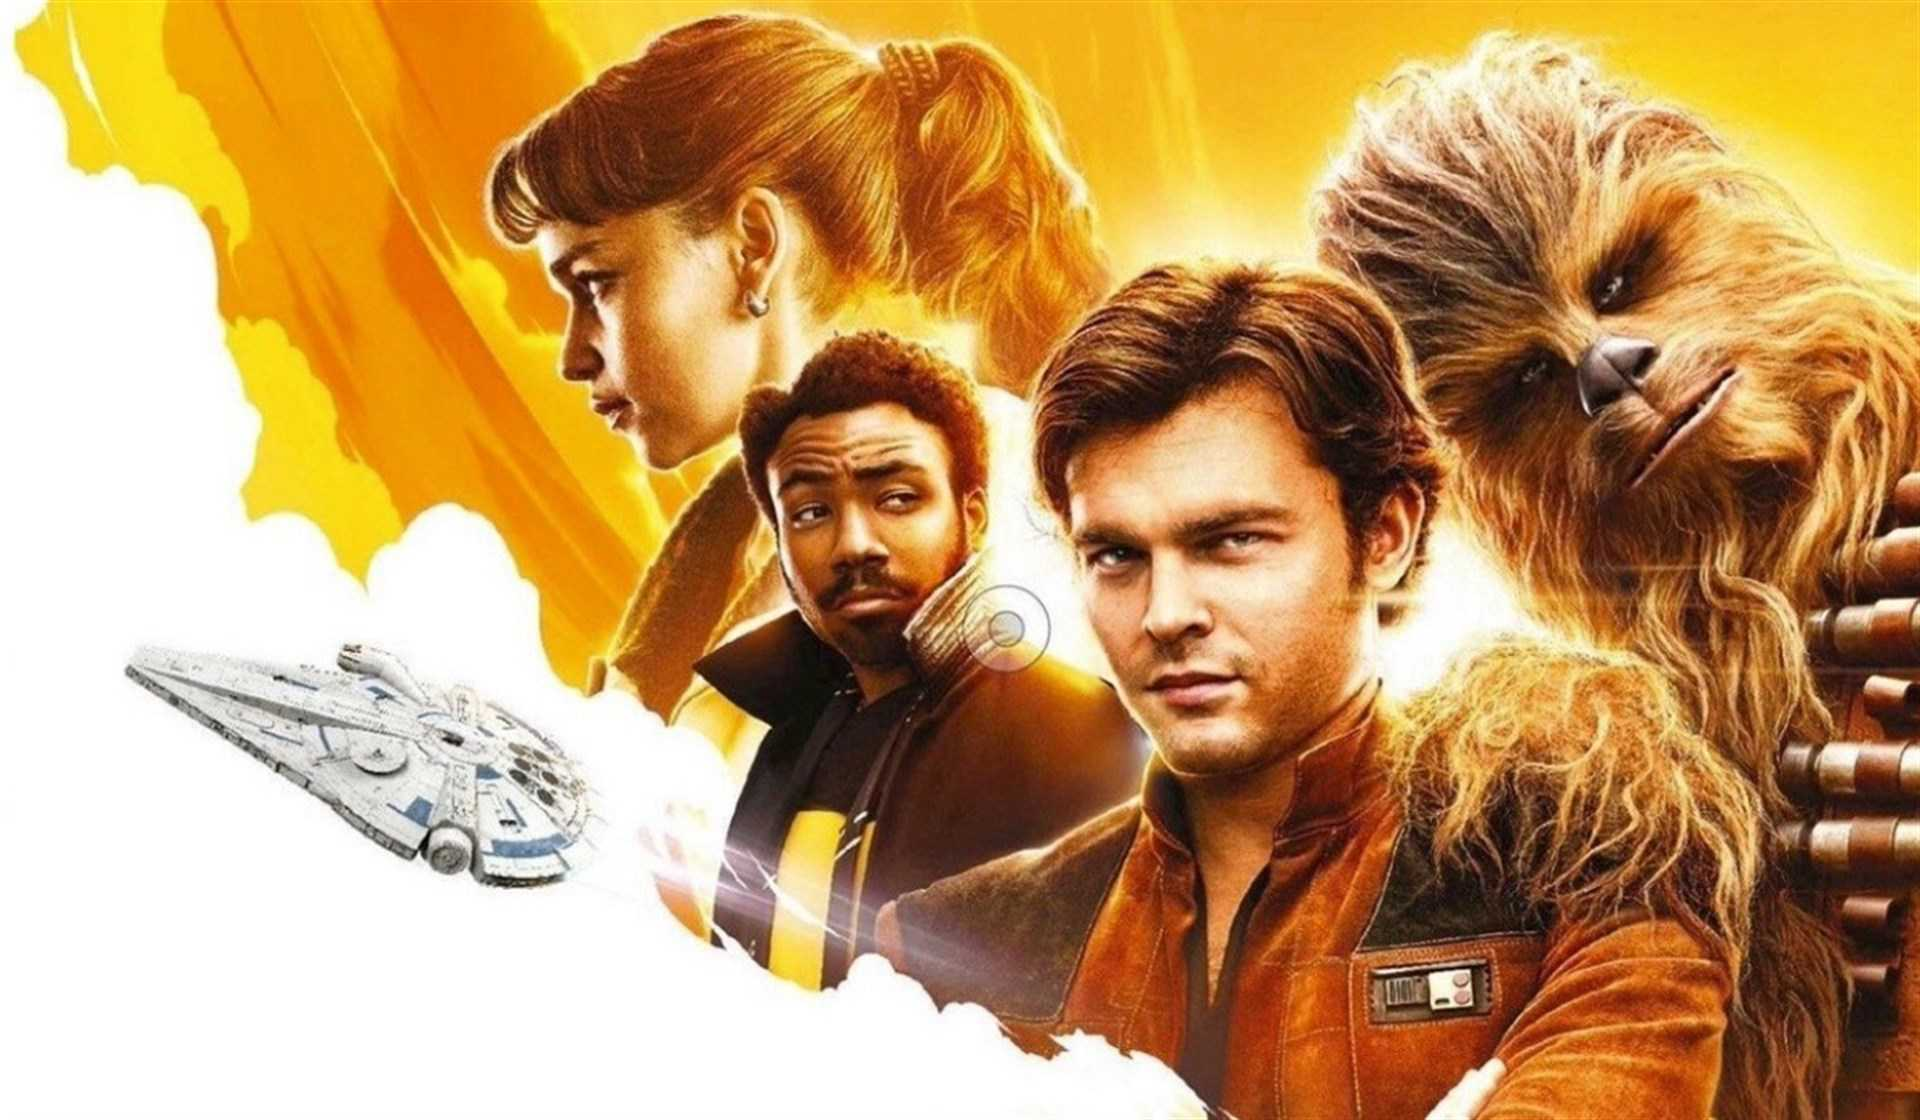 El falso póster de 'Solo: Una historia de Star Wars' que ha revolucionado Internet